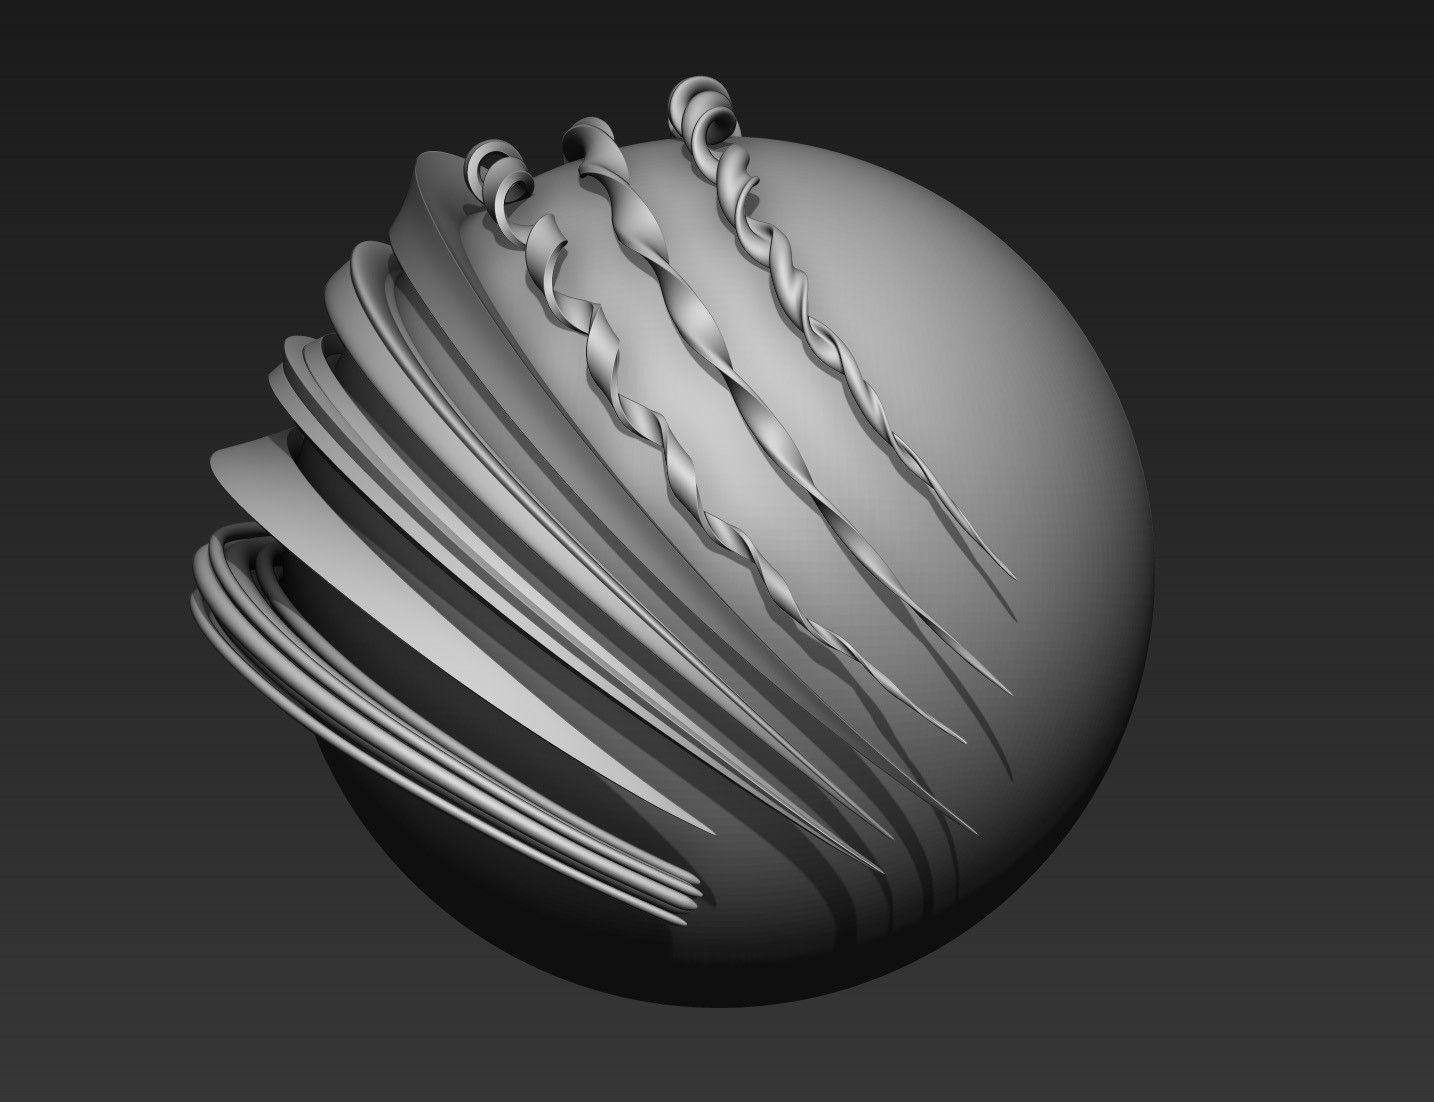 Unwrap In Zbrush Brushes - www san-akademie de